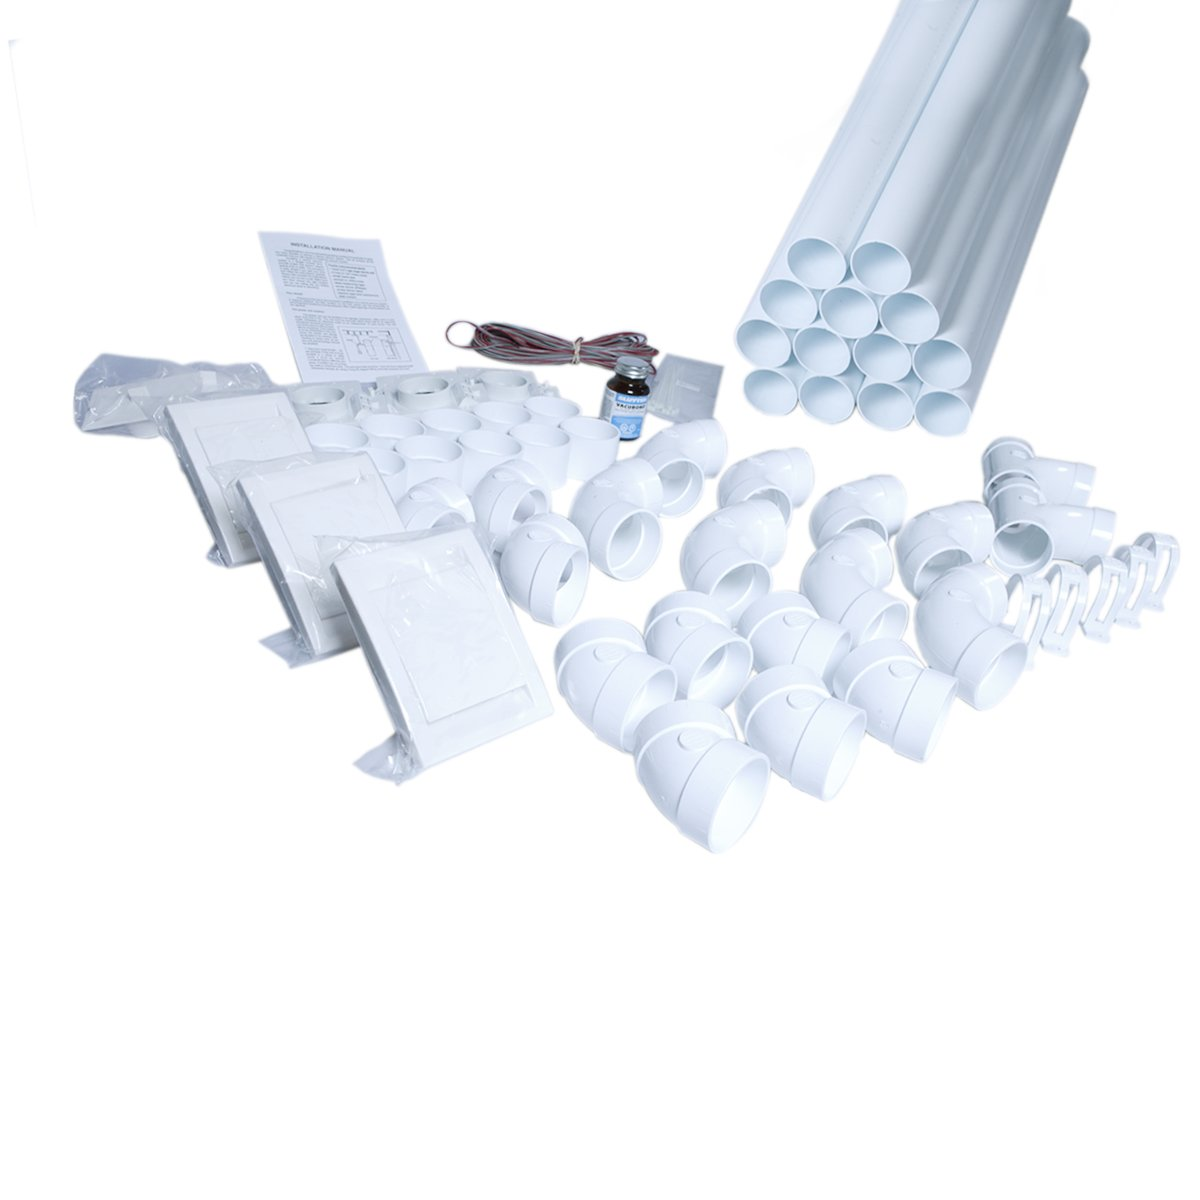 Einbau-Set für 3 DECO Saugdosen